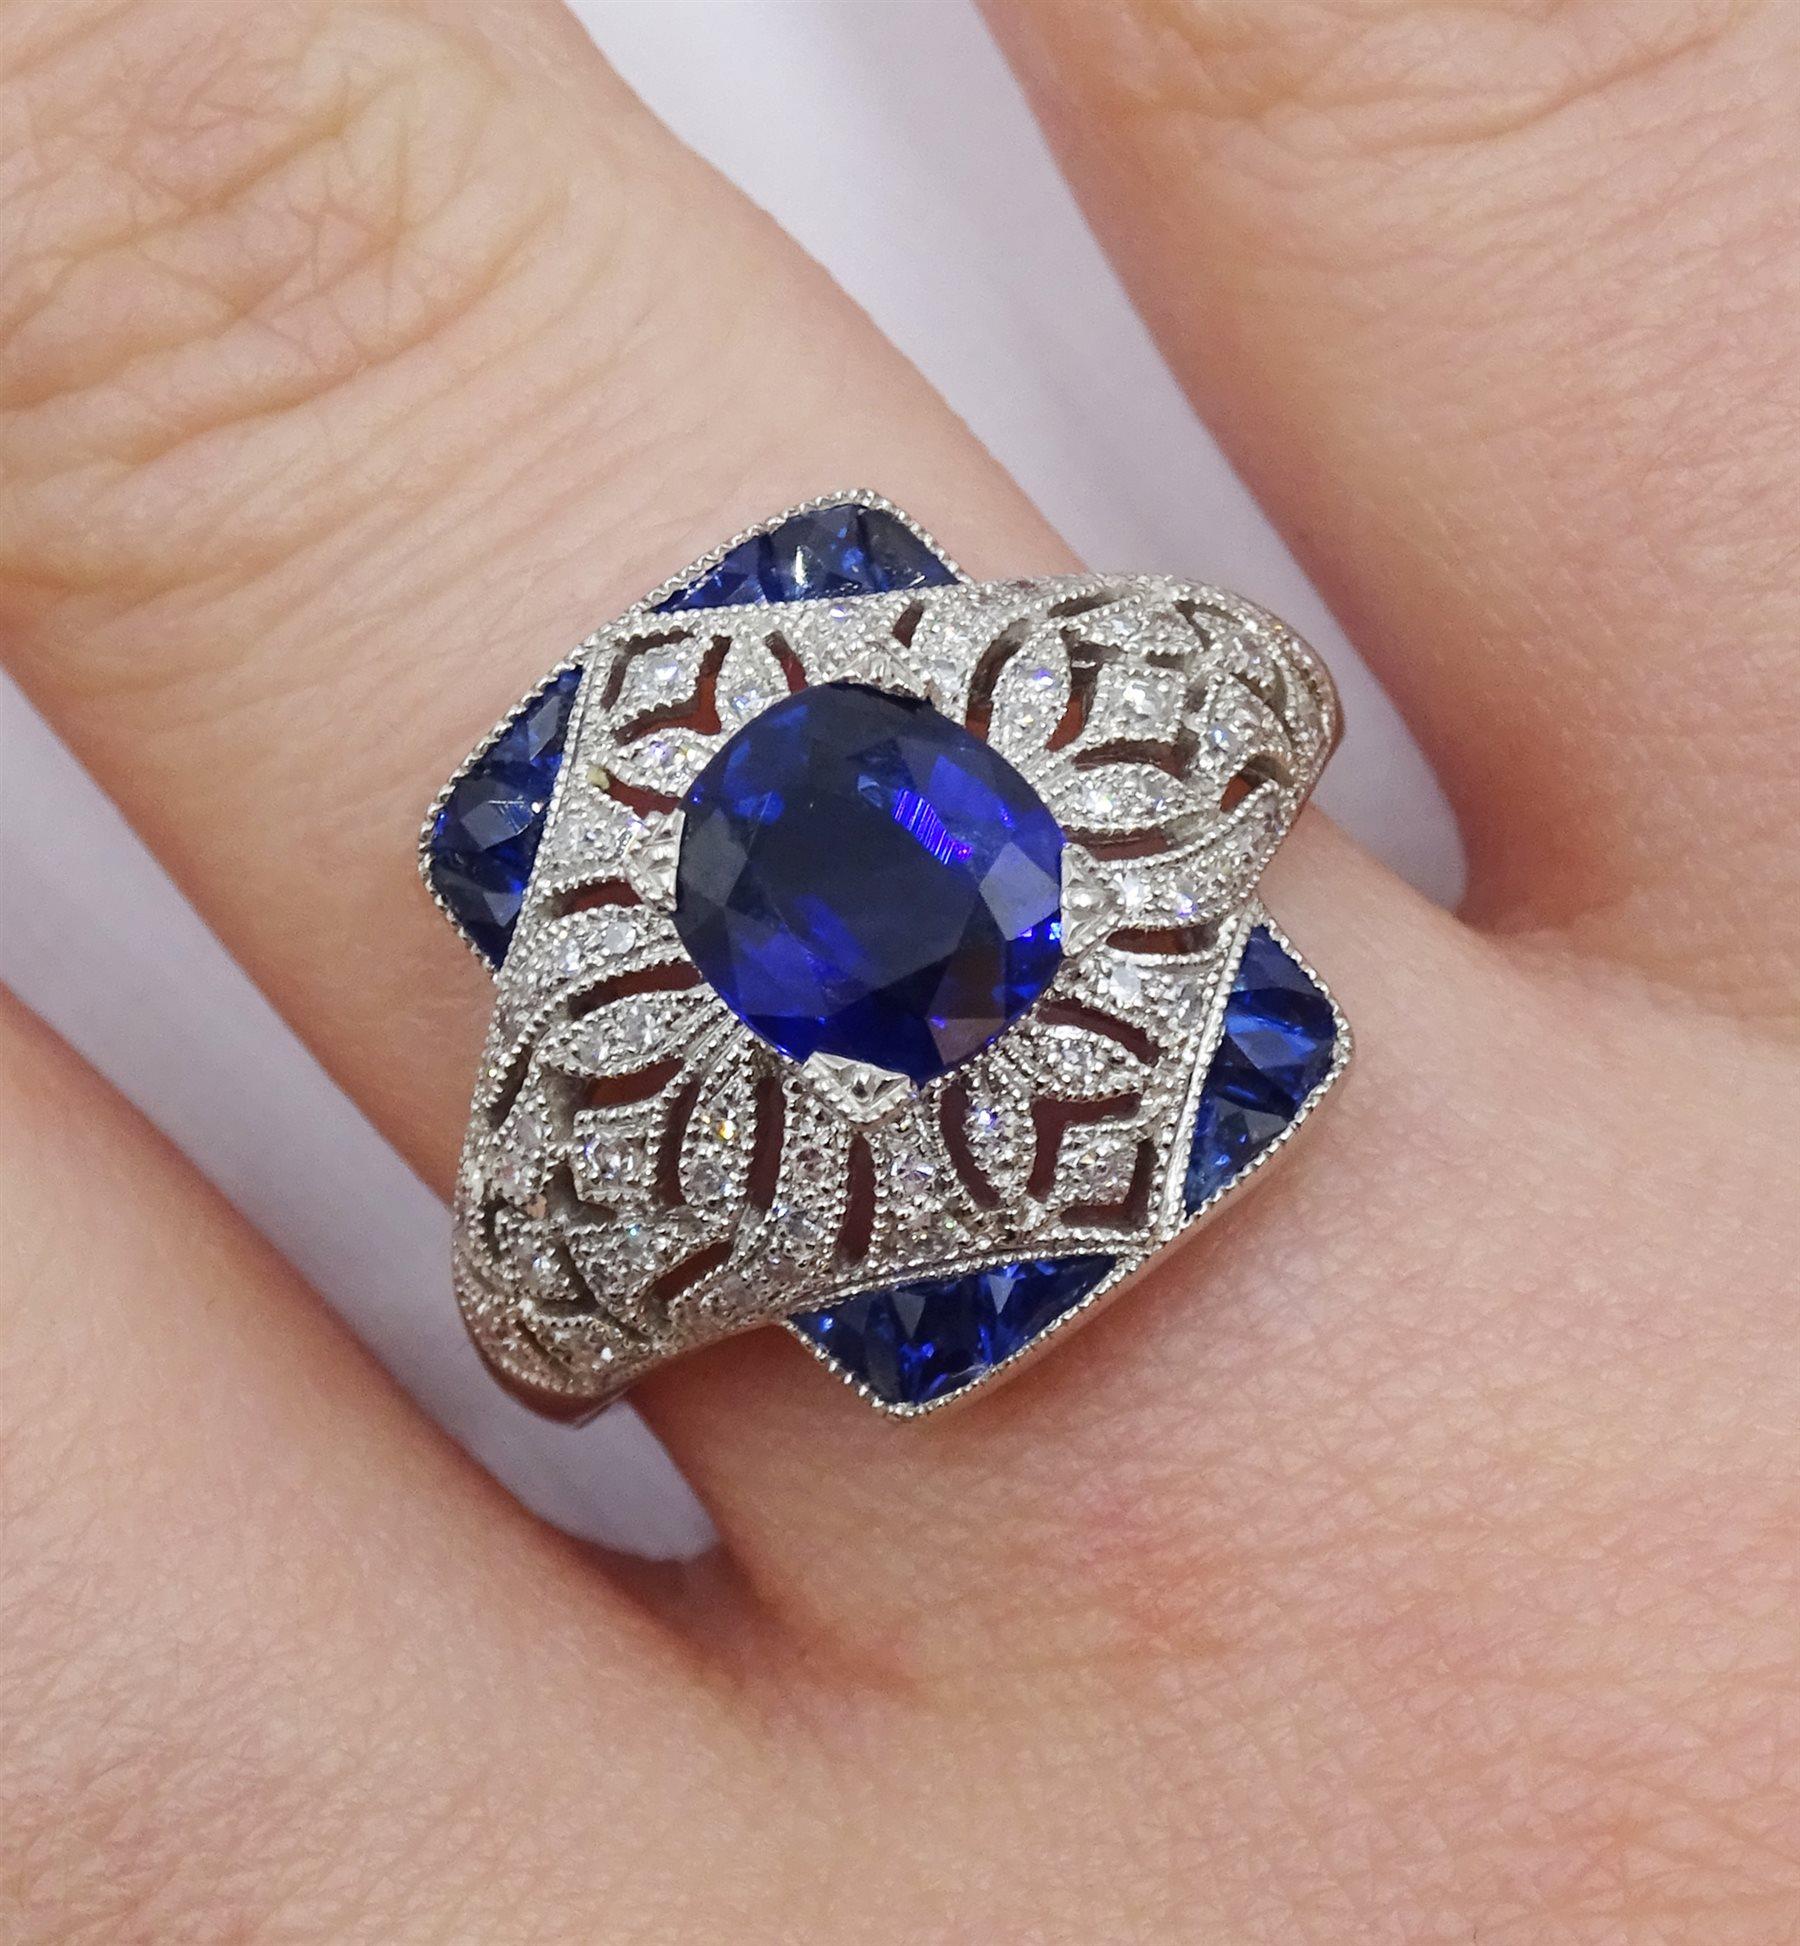 Platinum sapphire and diamond dress ring, pierced openwork setting, free UK mainland shipping - Image 2 of 6